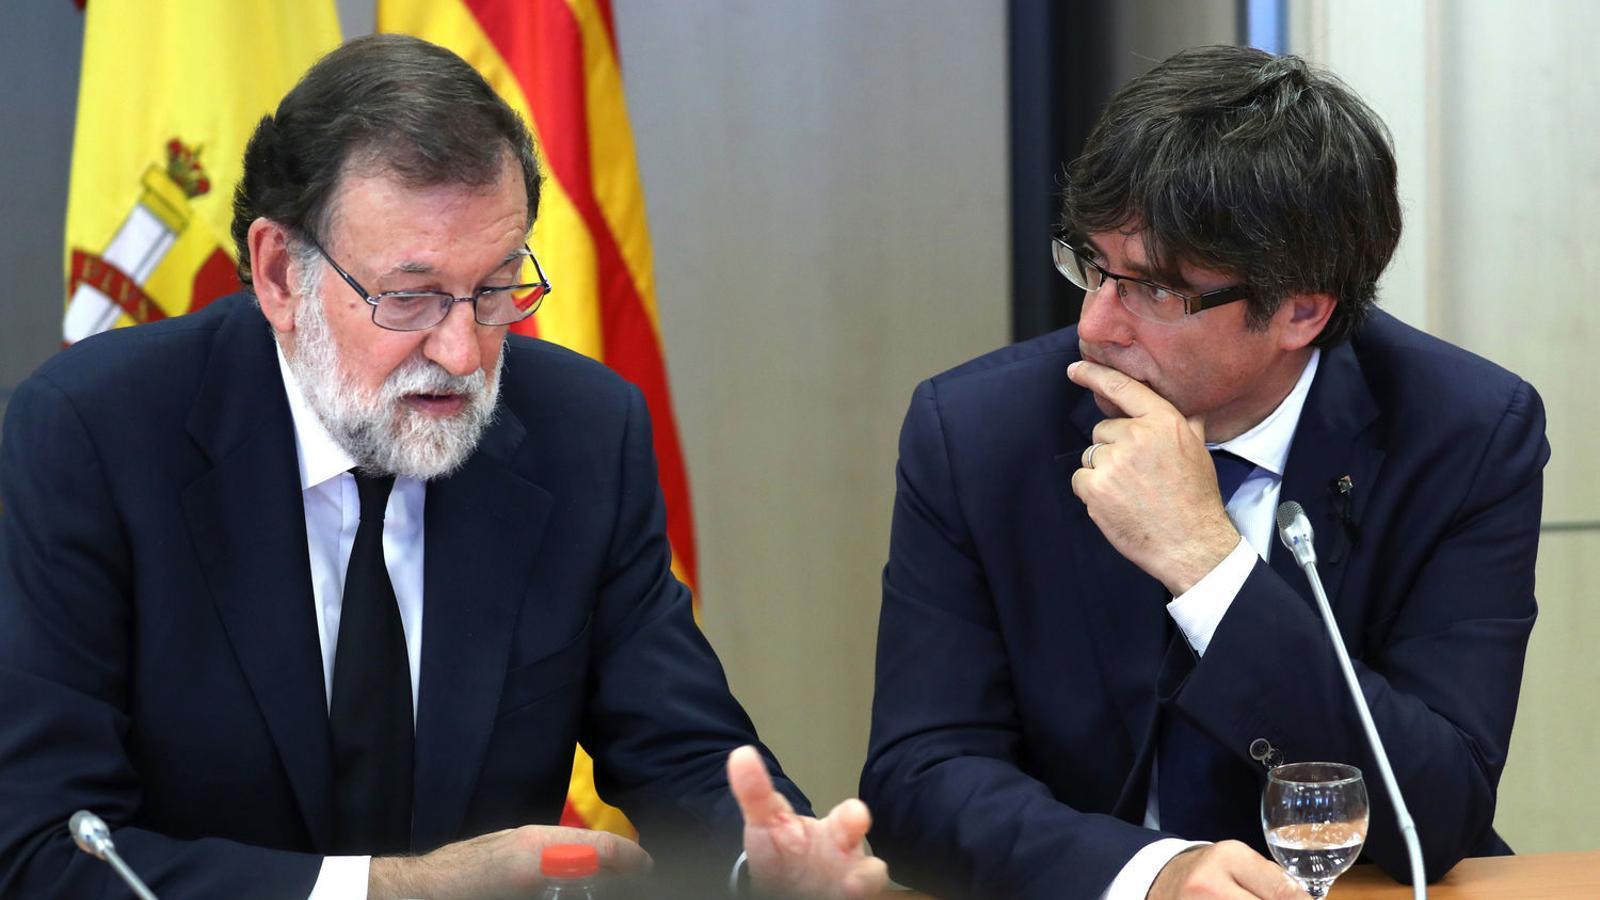 president-Mariano-Generalitat-Carles-Puigdemont_1856224561_46394906_1500x1000.jpg